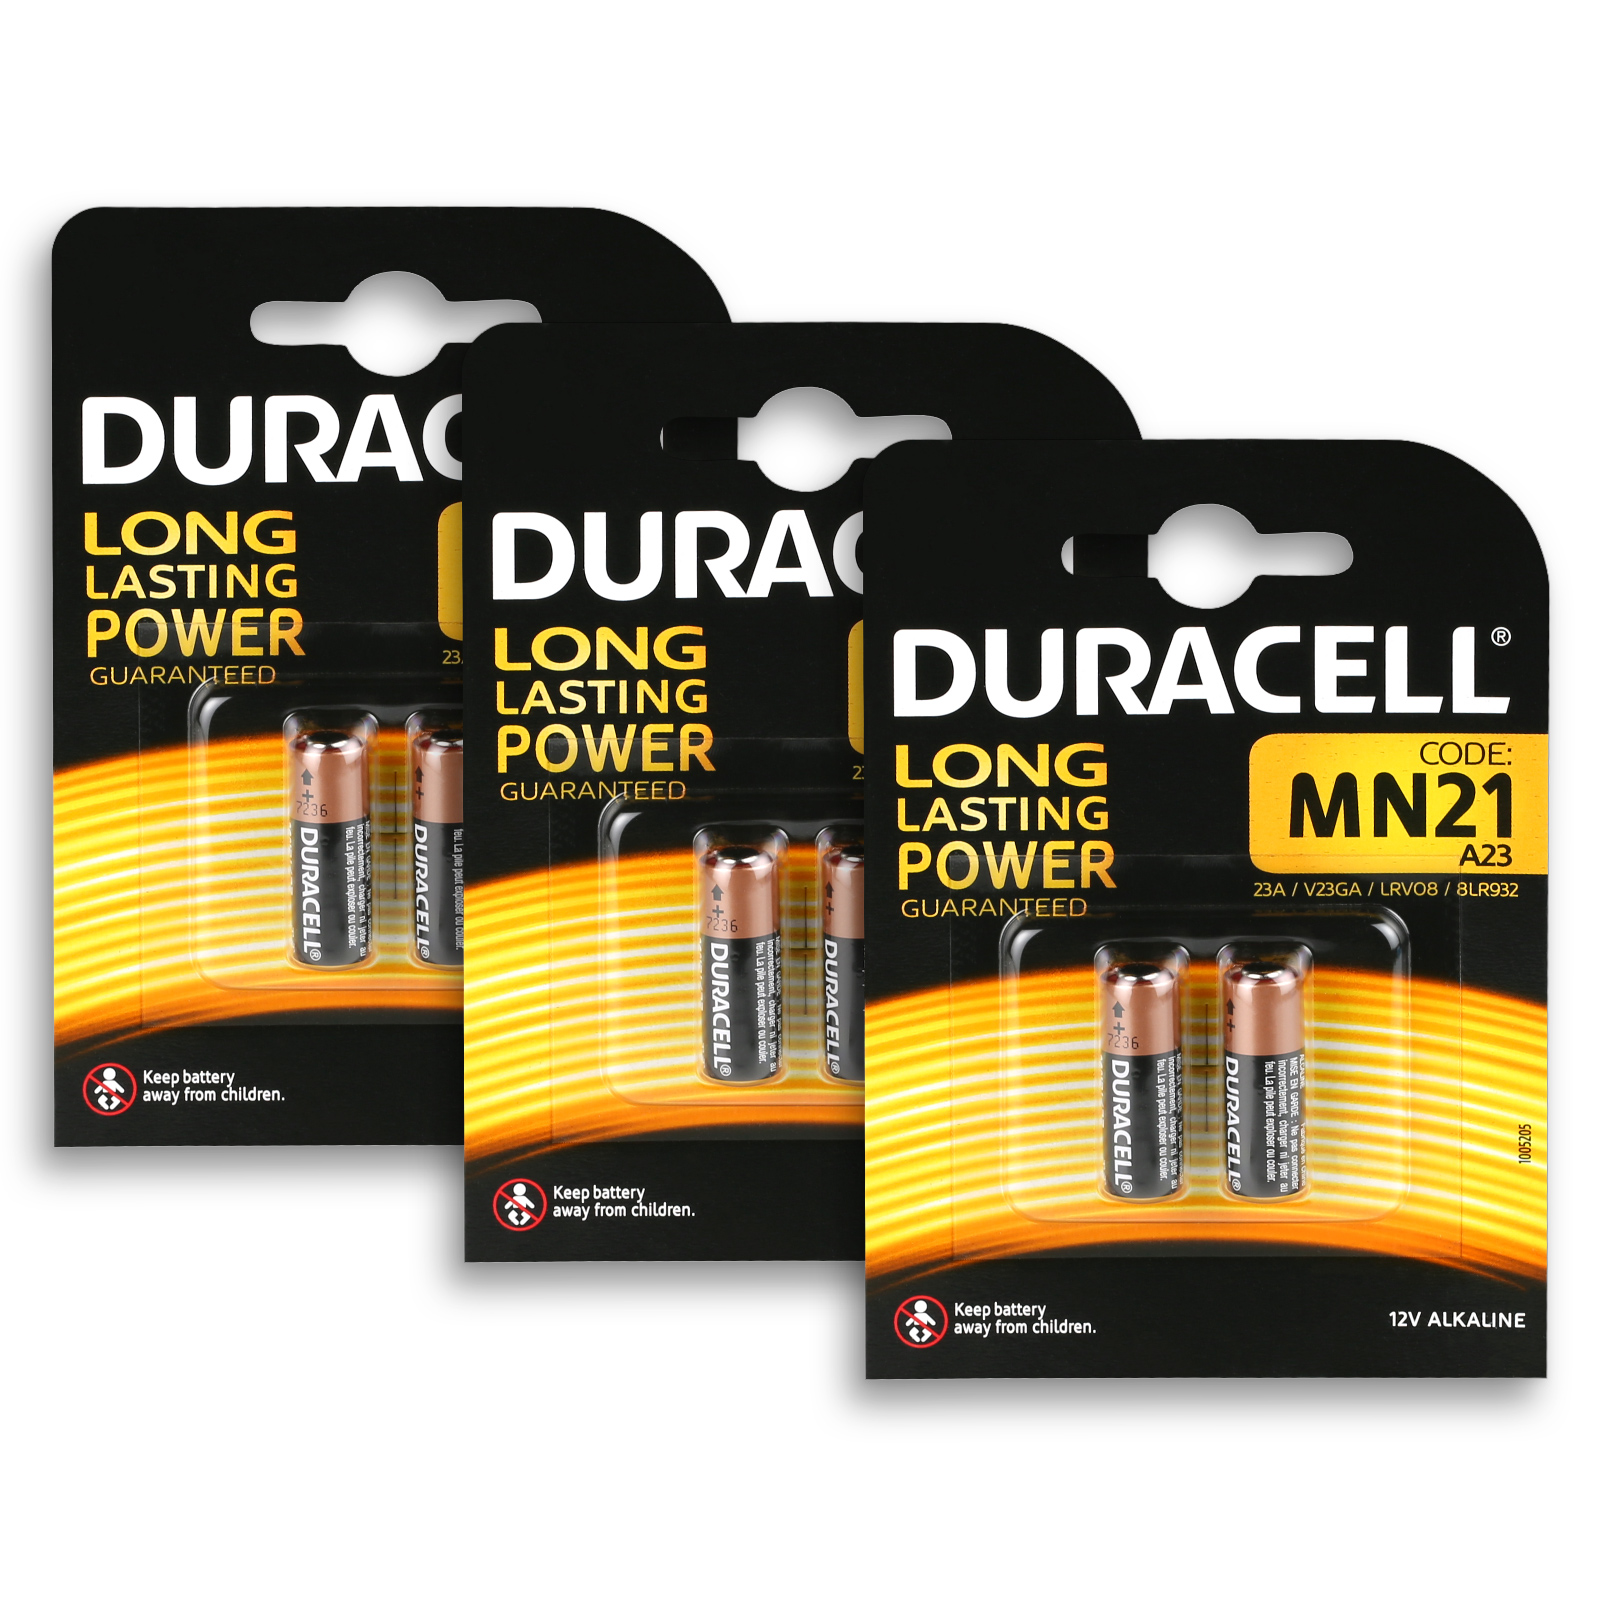 5x Duracell Mn21 Batterie 12v 33mah 23ga Lrv08 23a